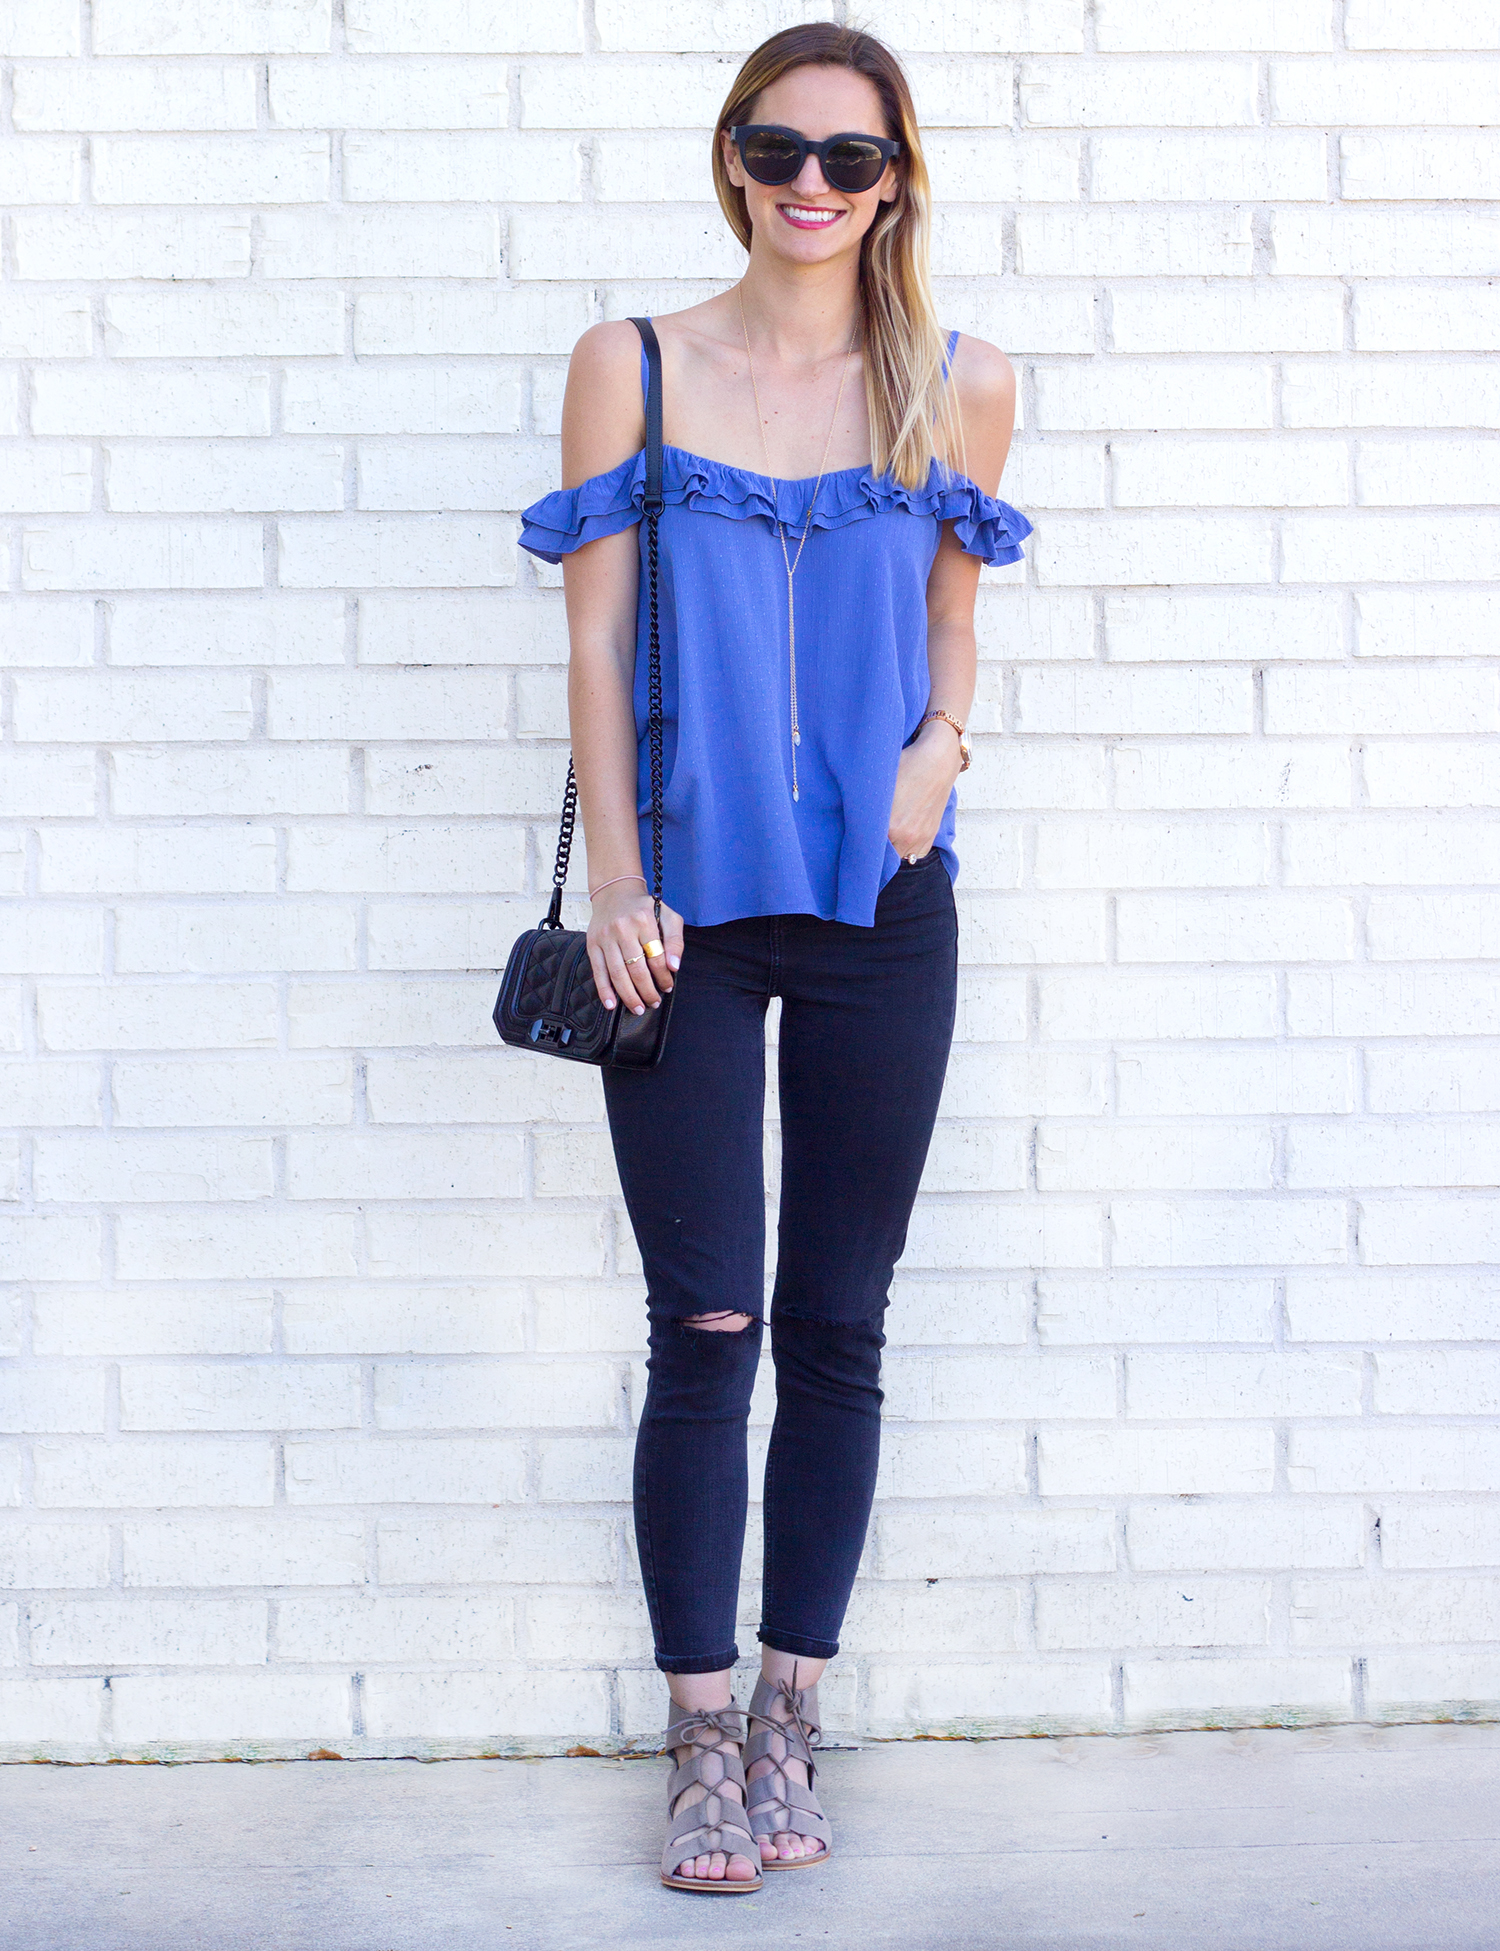 livvyland-blog-olivia-watson-austin-texas-fashion-blogger-topshop-ruffled-off-shoulder-cold-top-black-distressed-skinny-jeans-rebecca-minkoff-mini-love-affair-handbag-8